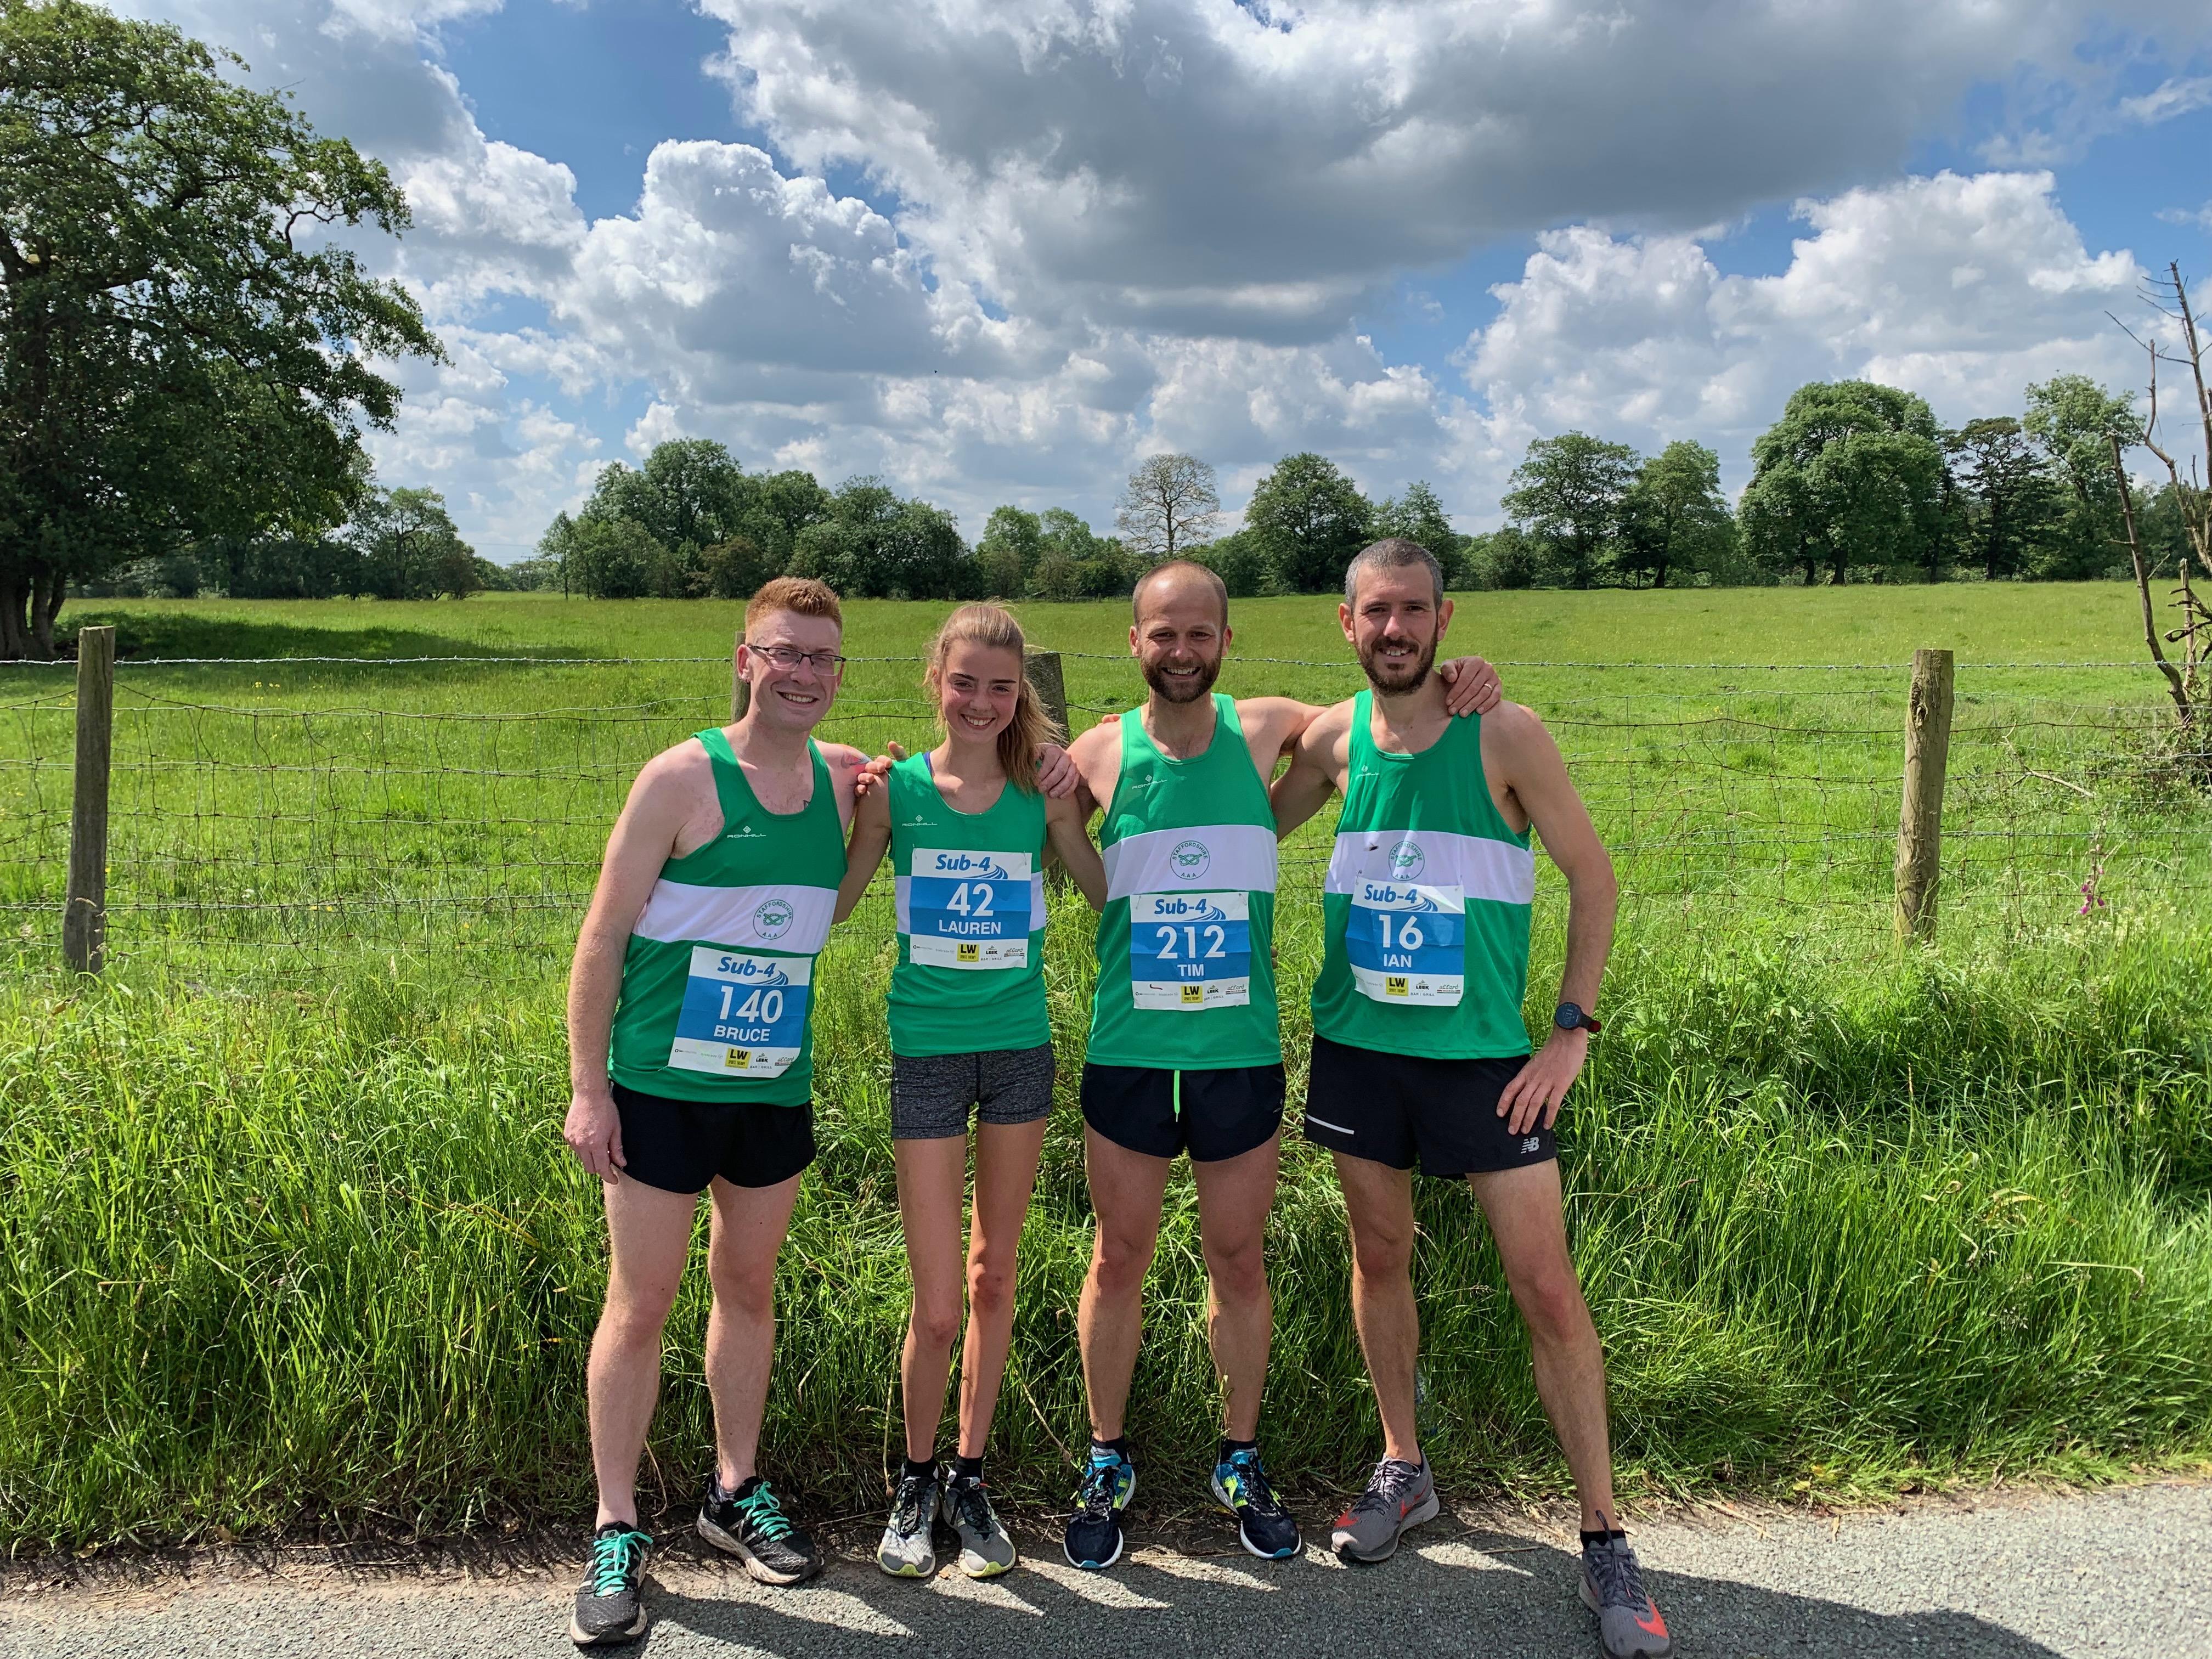 Meerbrook 15km – 22/6/2019